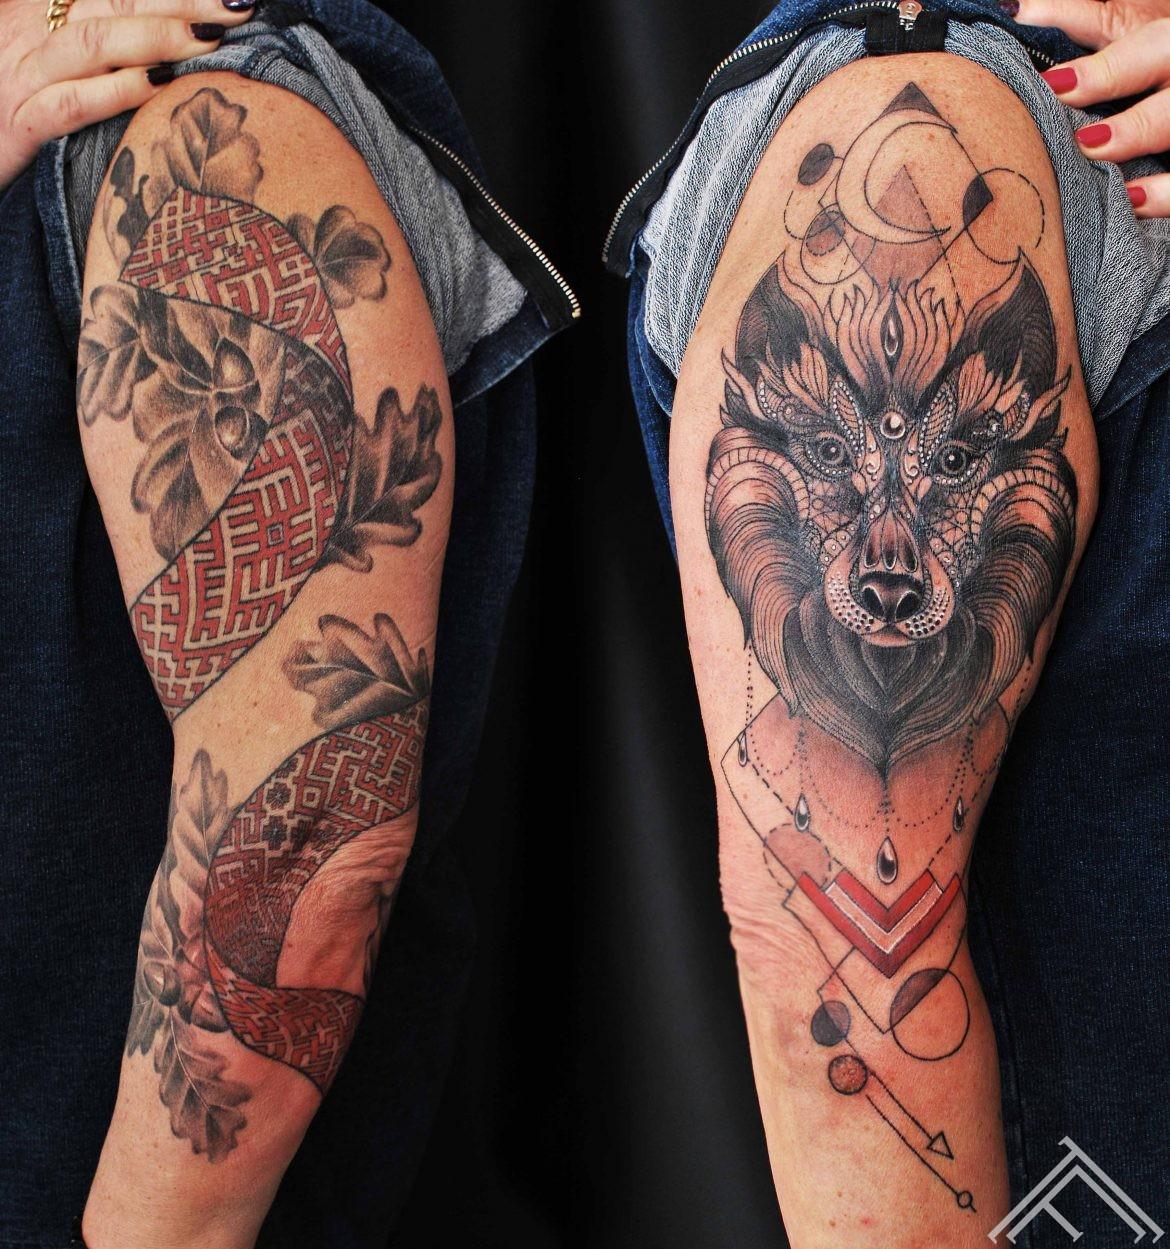 latviansymbol-tattoo-tattoofrequency-riga-janisanderson-tetovejums